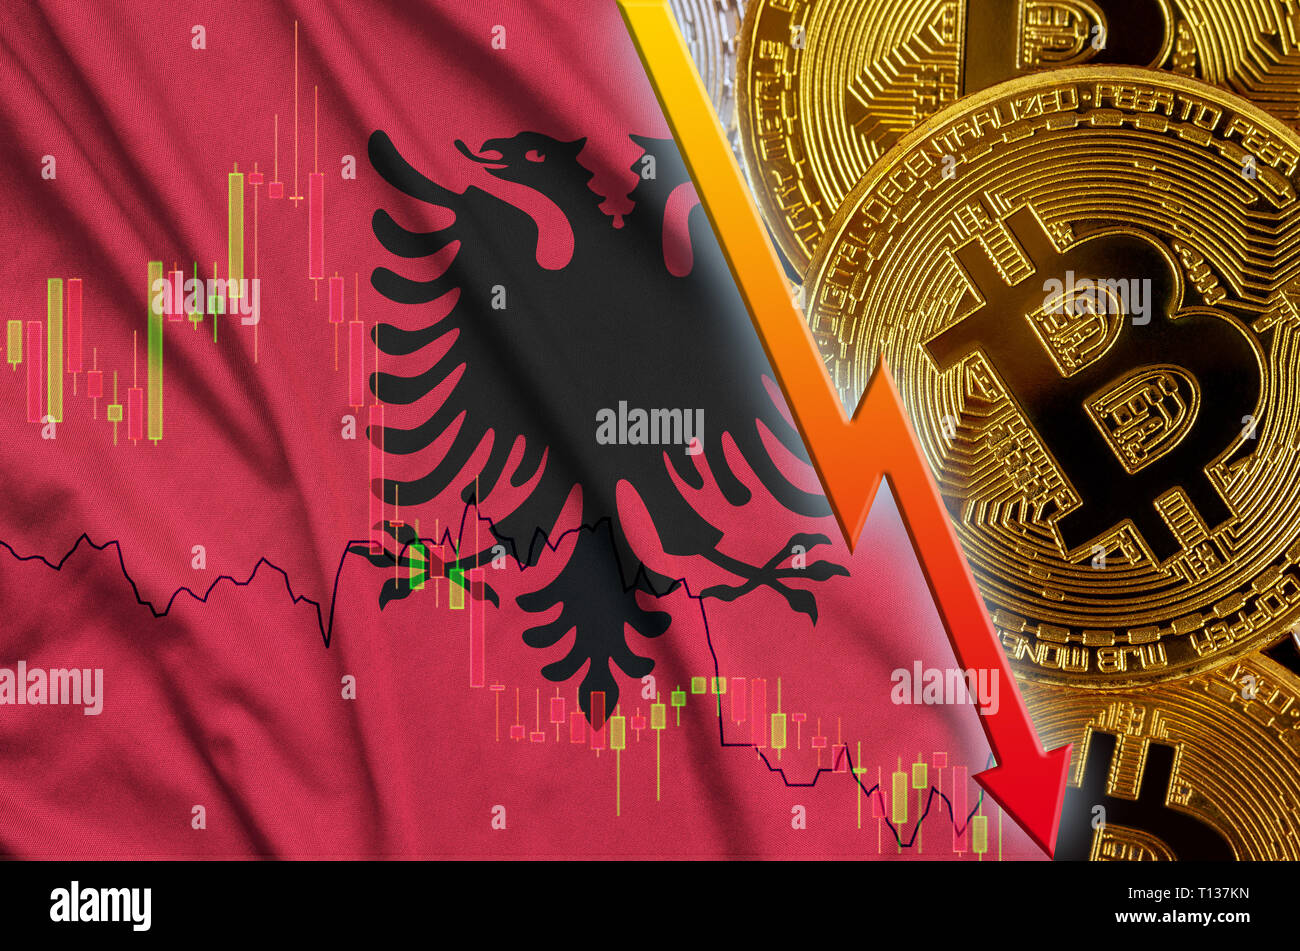 Albania Lose Stock Photos & Albania Lose Stock Images - Alamy